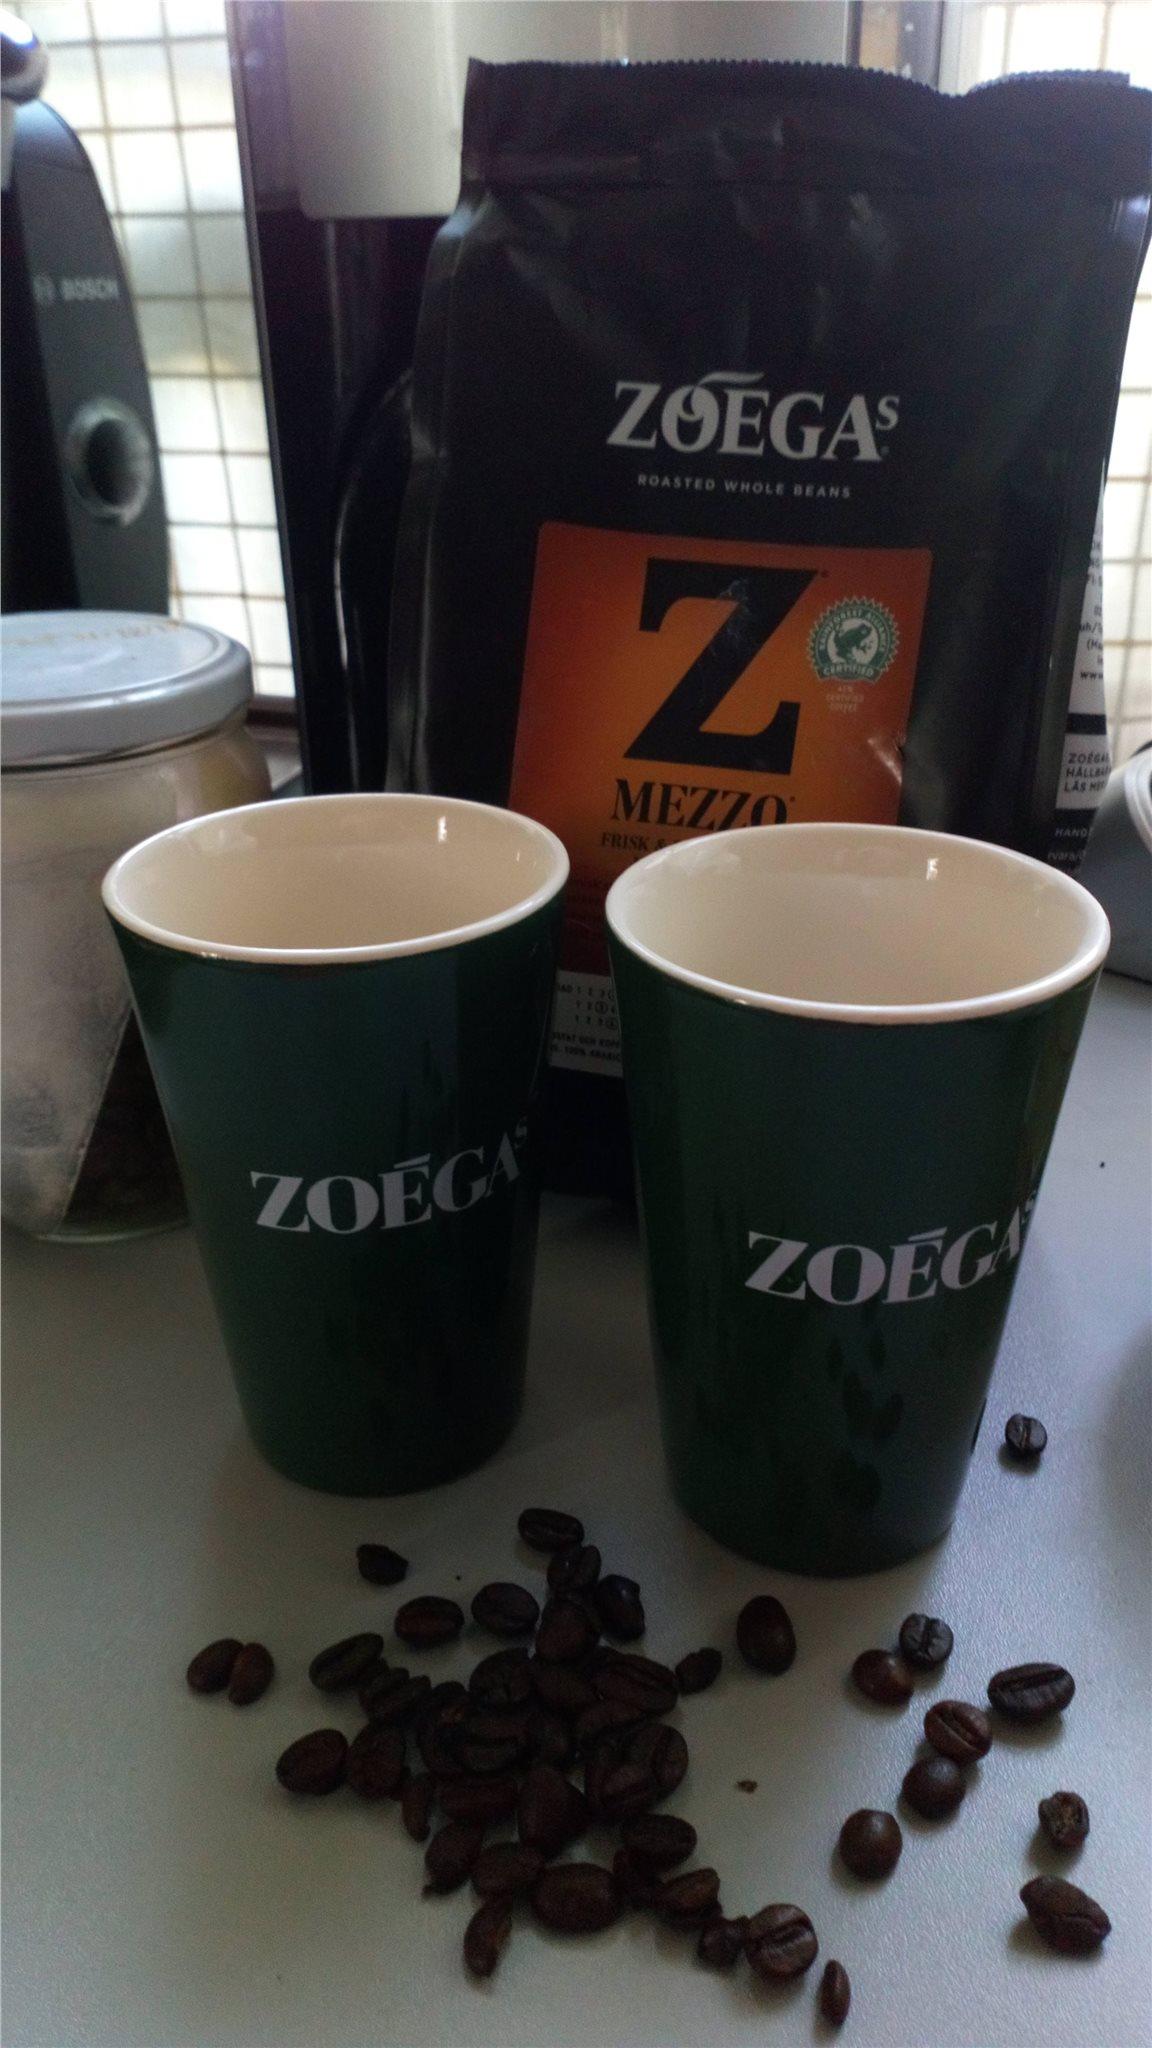 zoegas kaffe muggar